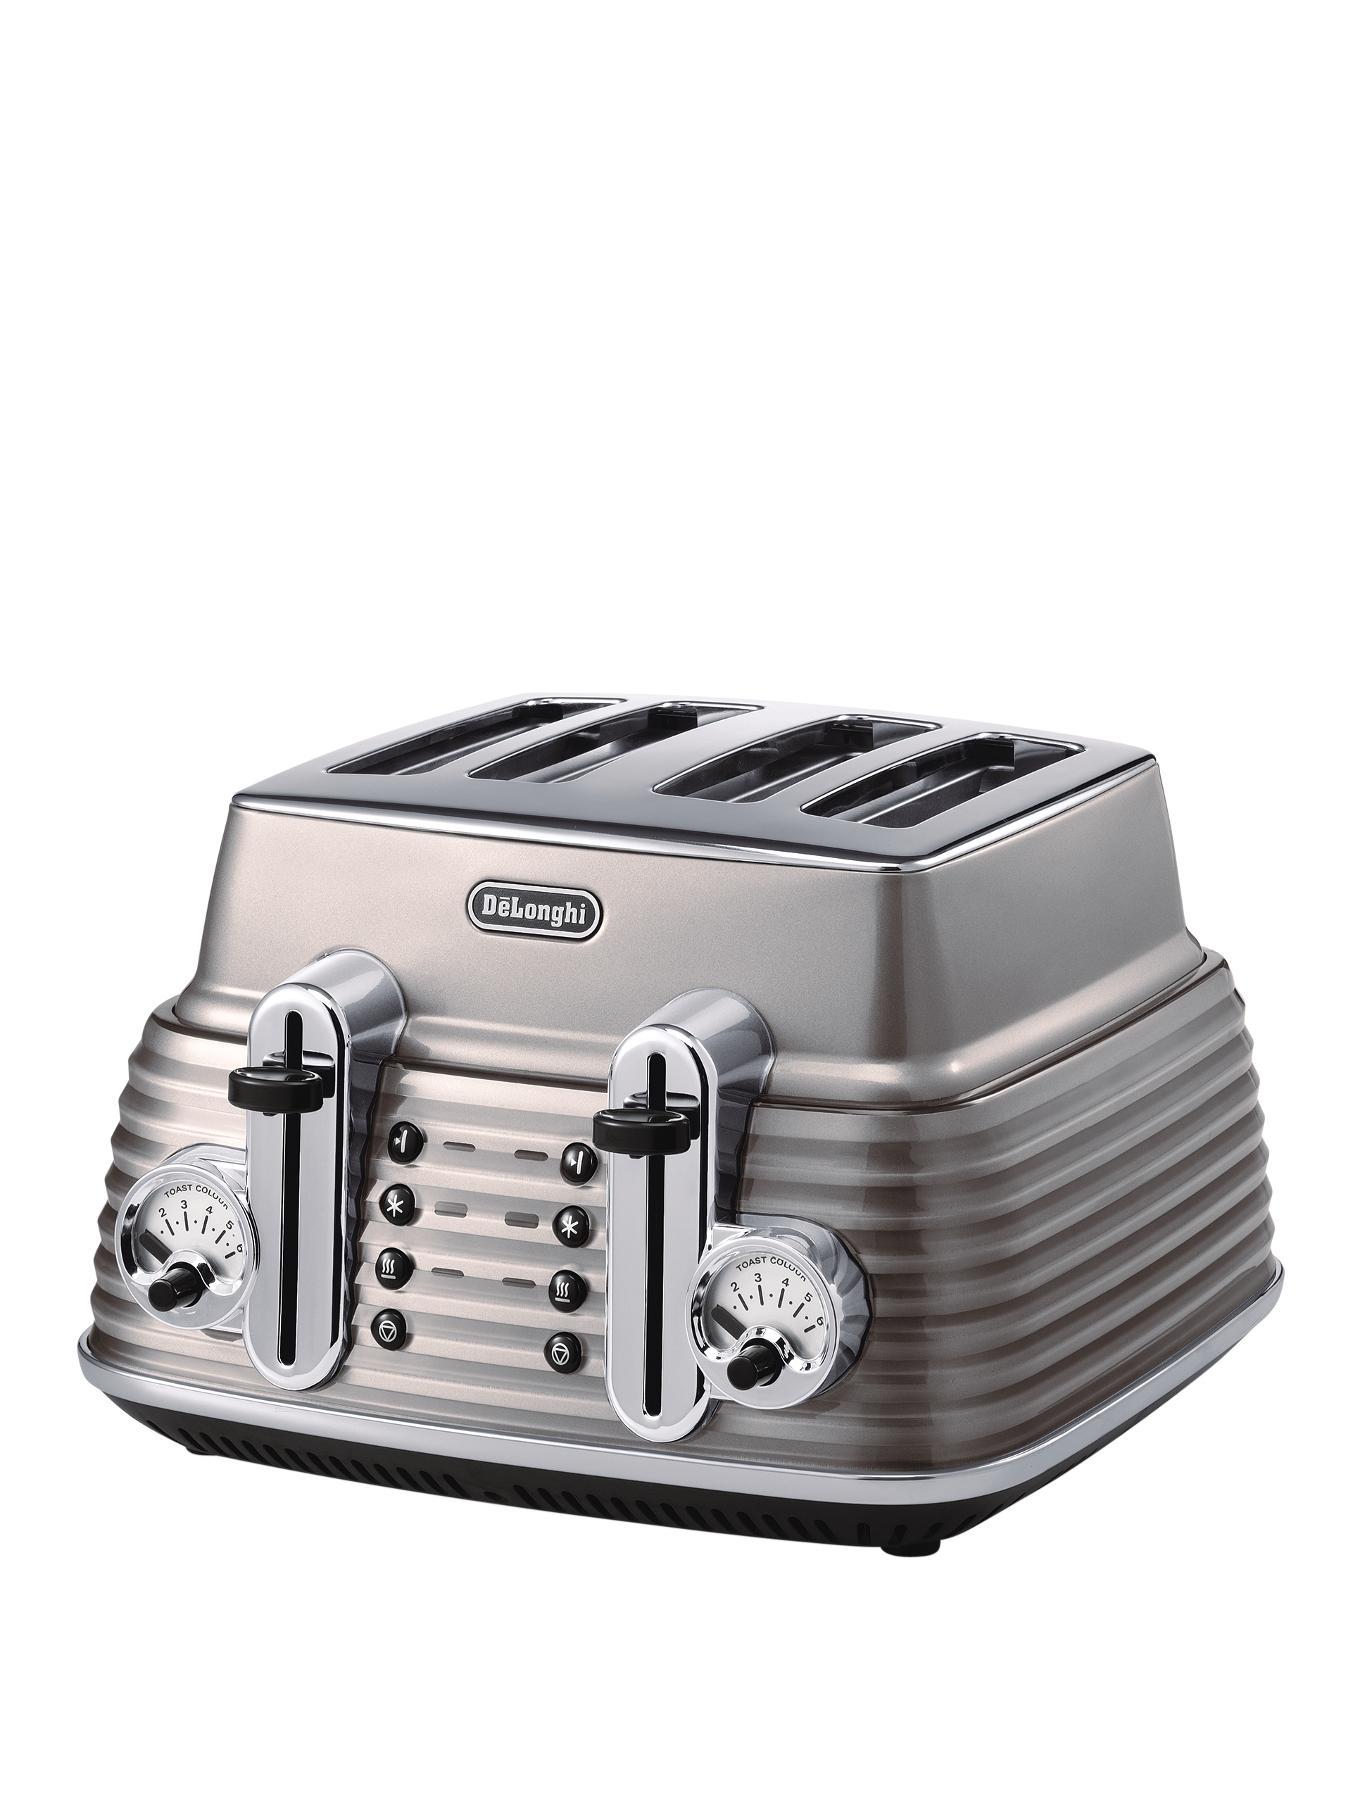 Scultura CTZ4003.BG 4 Slice Toaster - Champagne